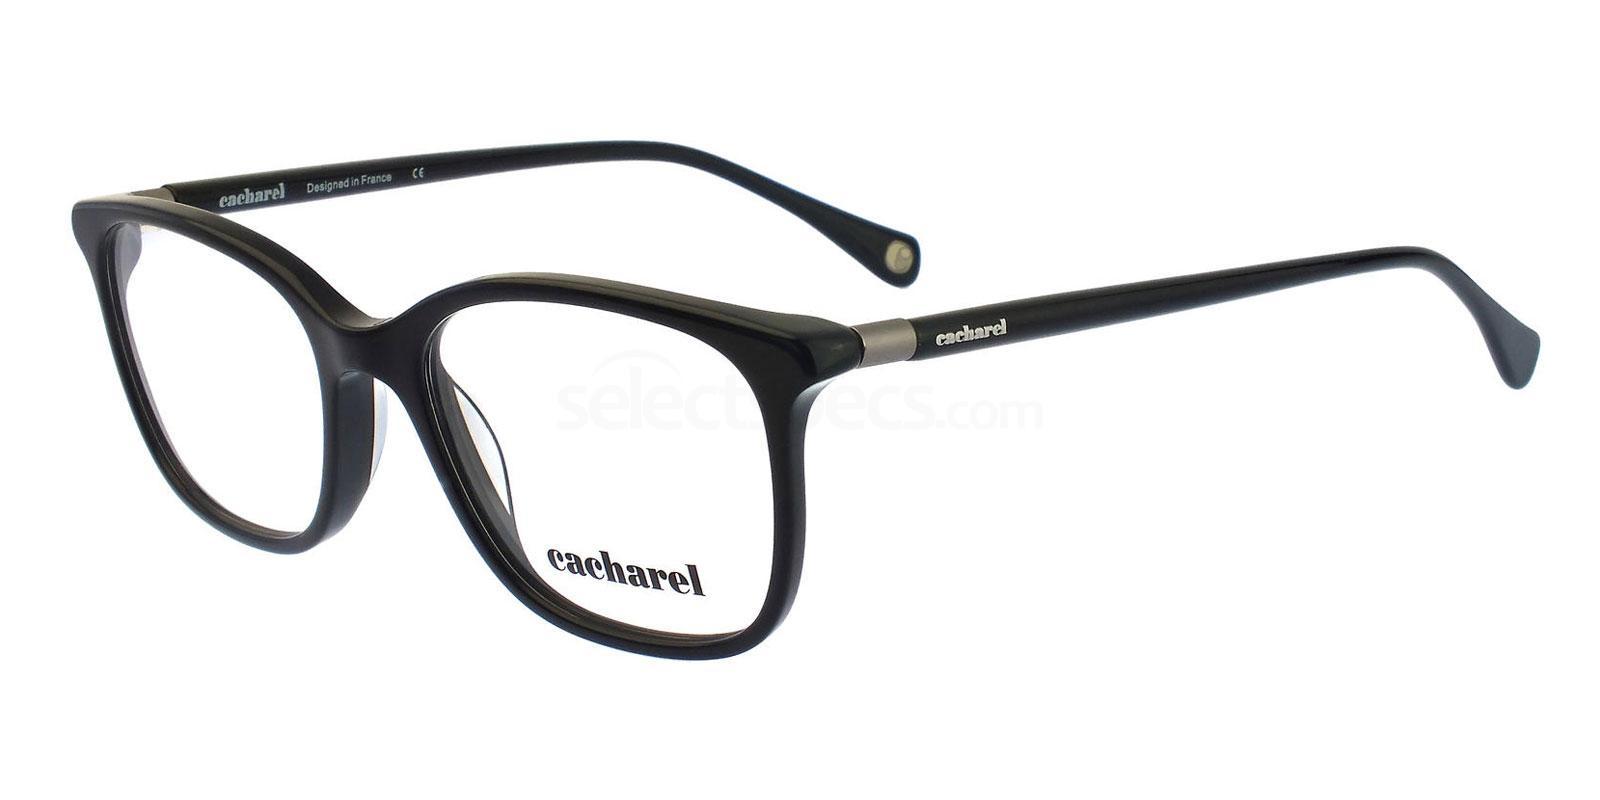 001 CA3016 Glasses, Cacharel